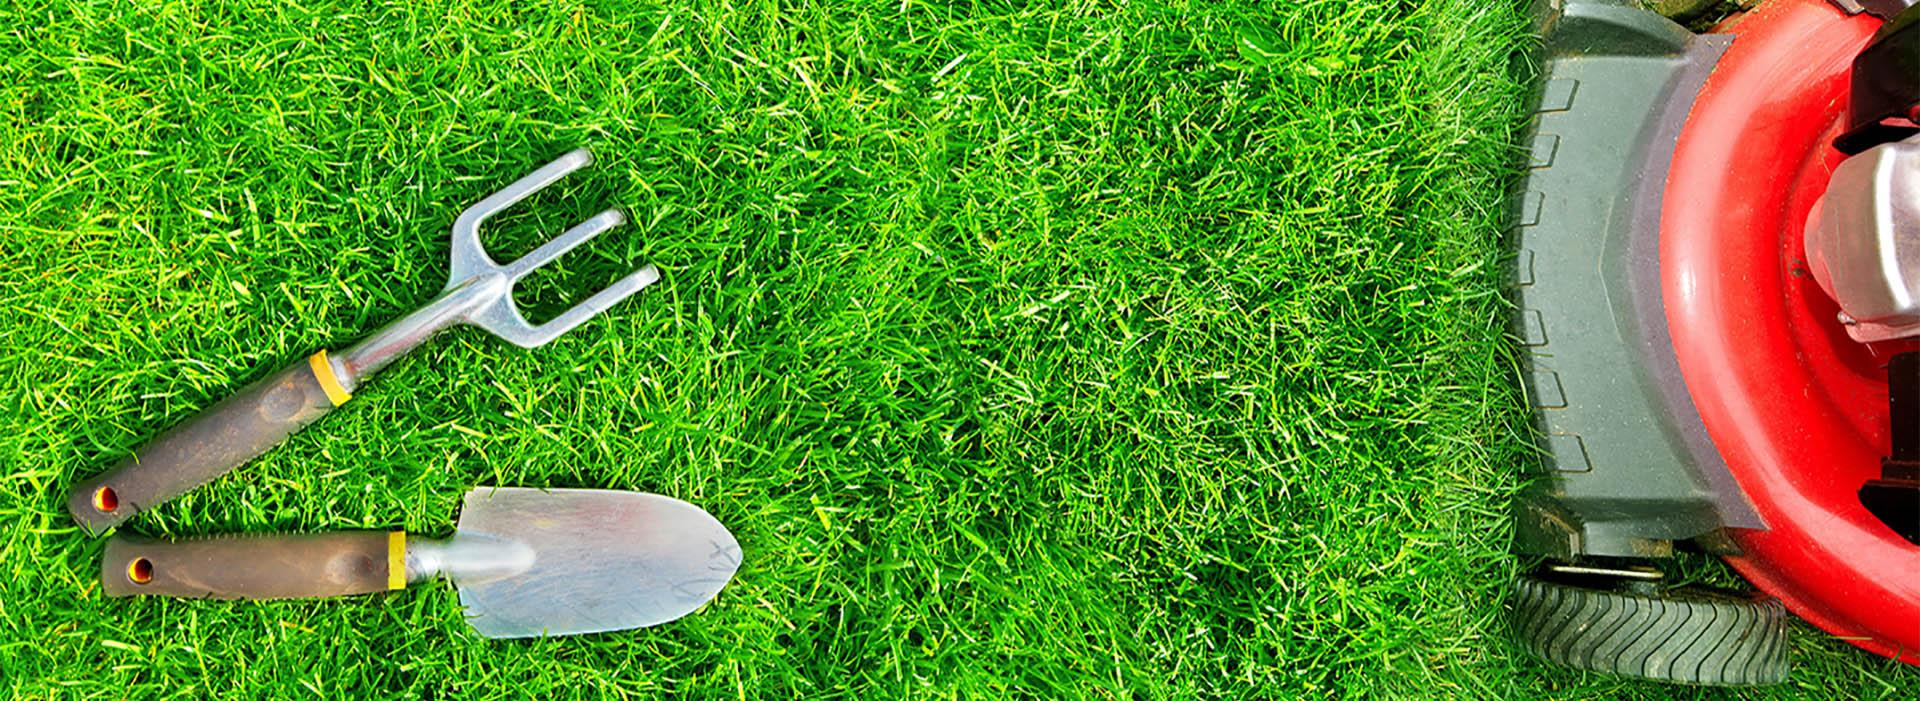 Gartenpflege und Rasenpflege